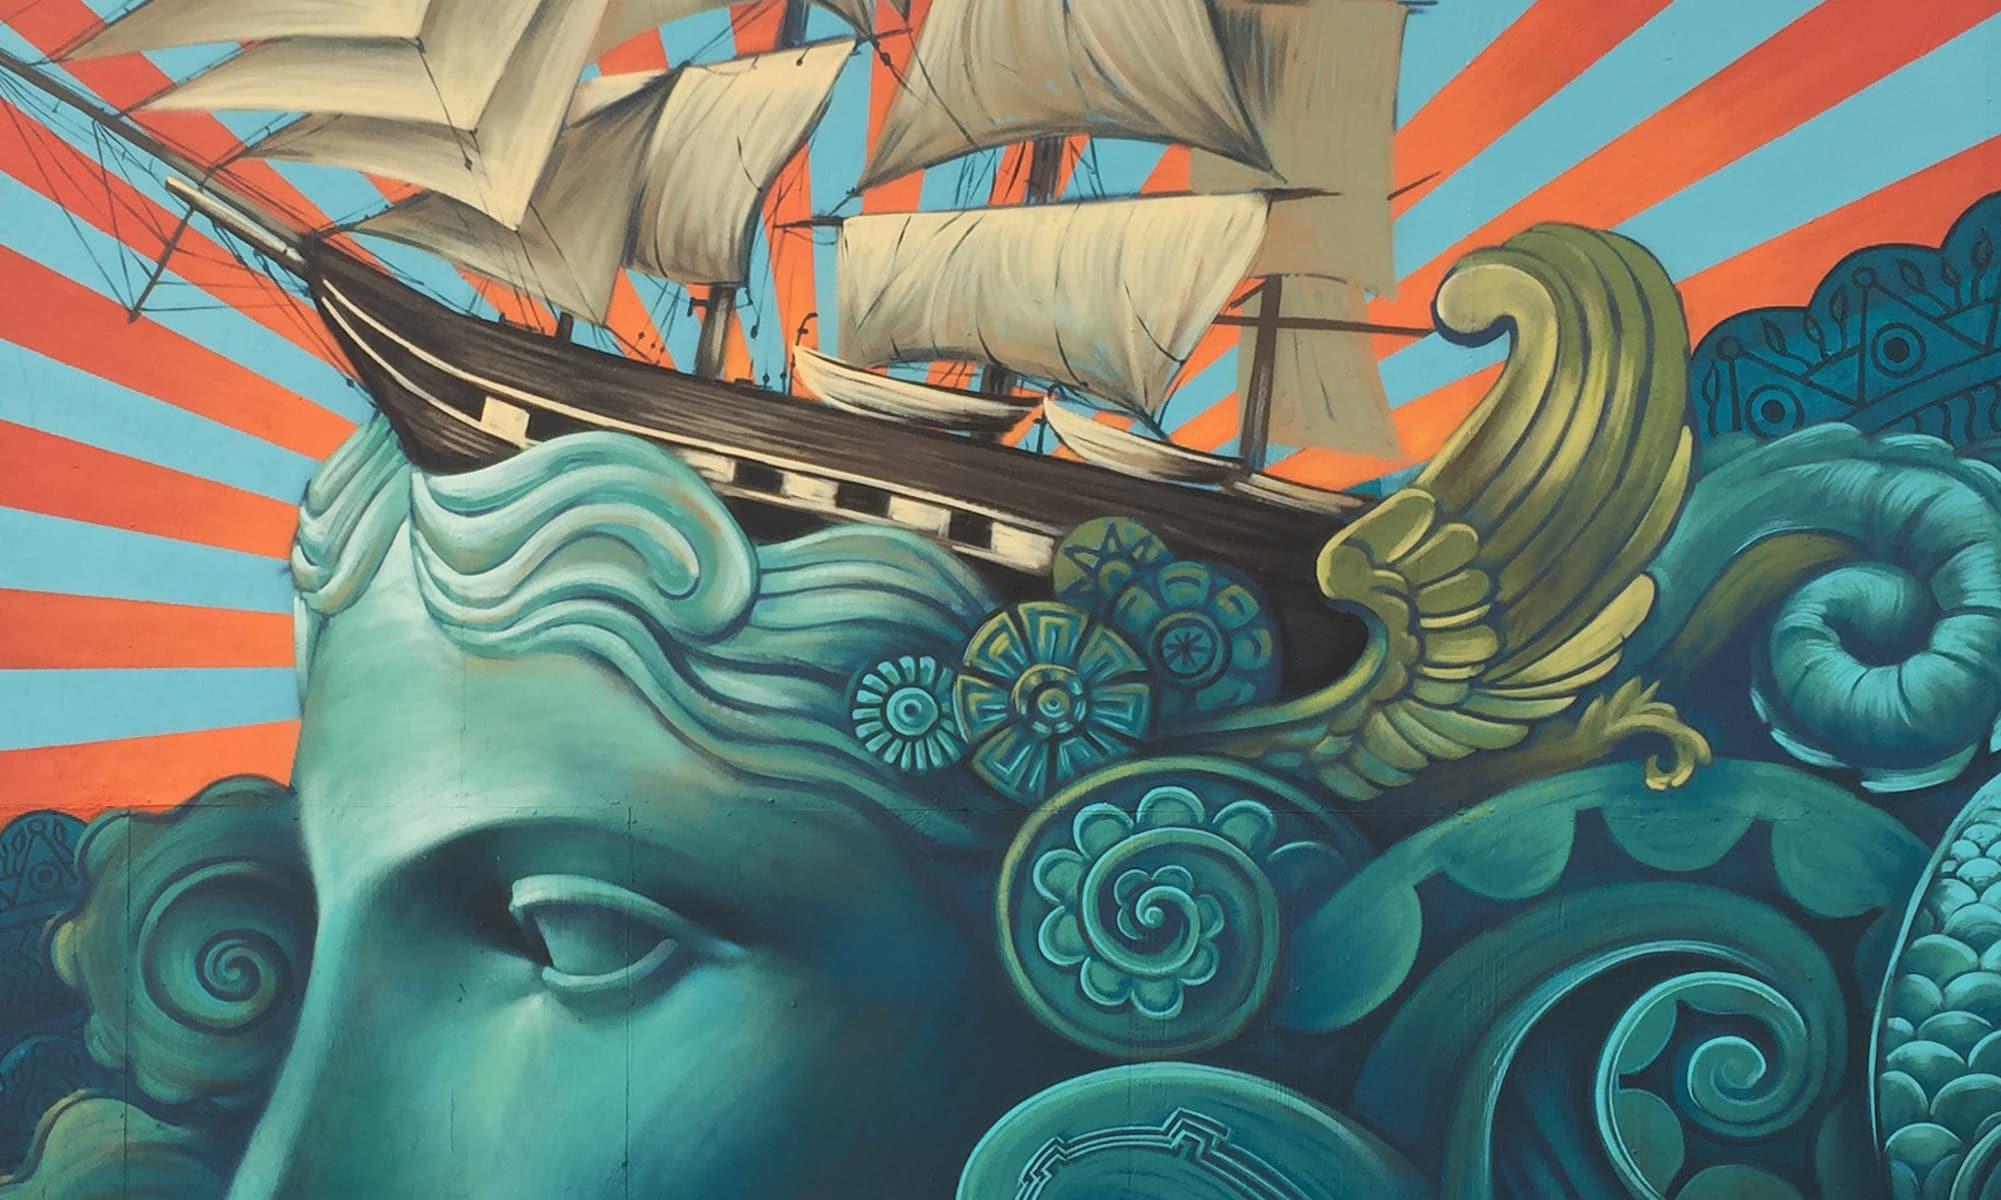 Street Artiste : Beau Stanton